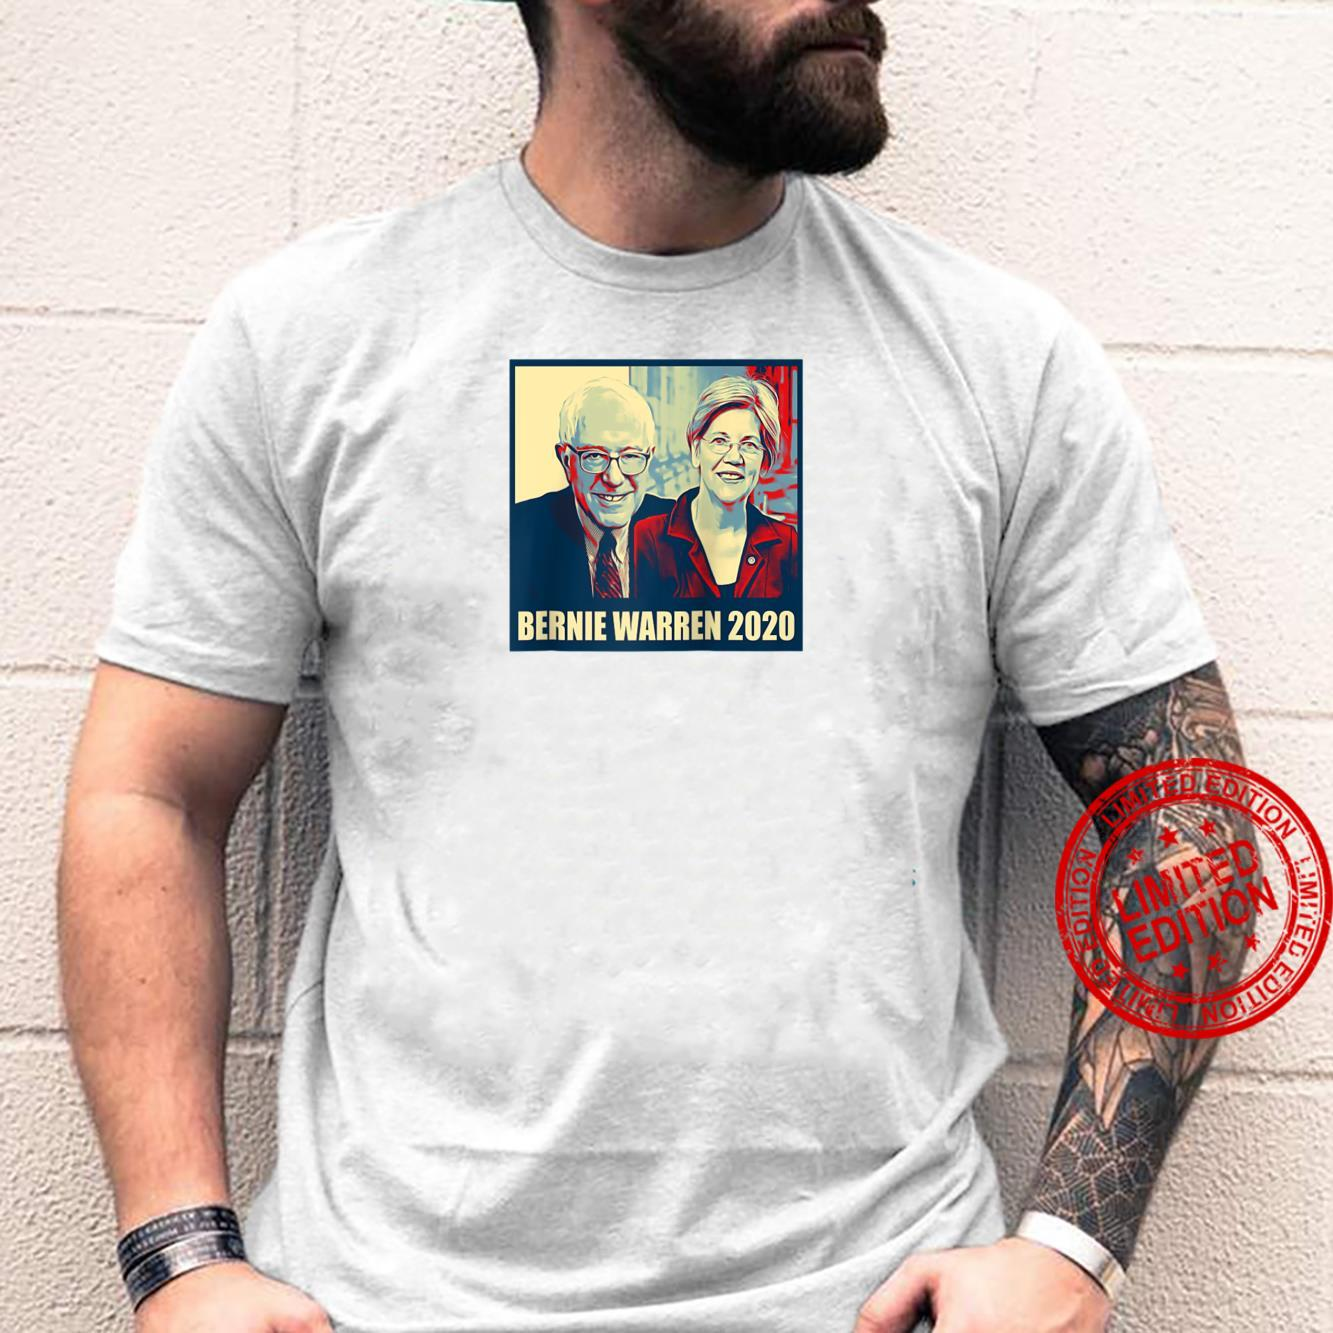 Bernie Warren 2020 shirt